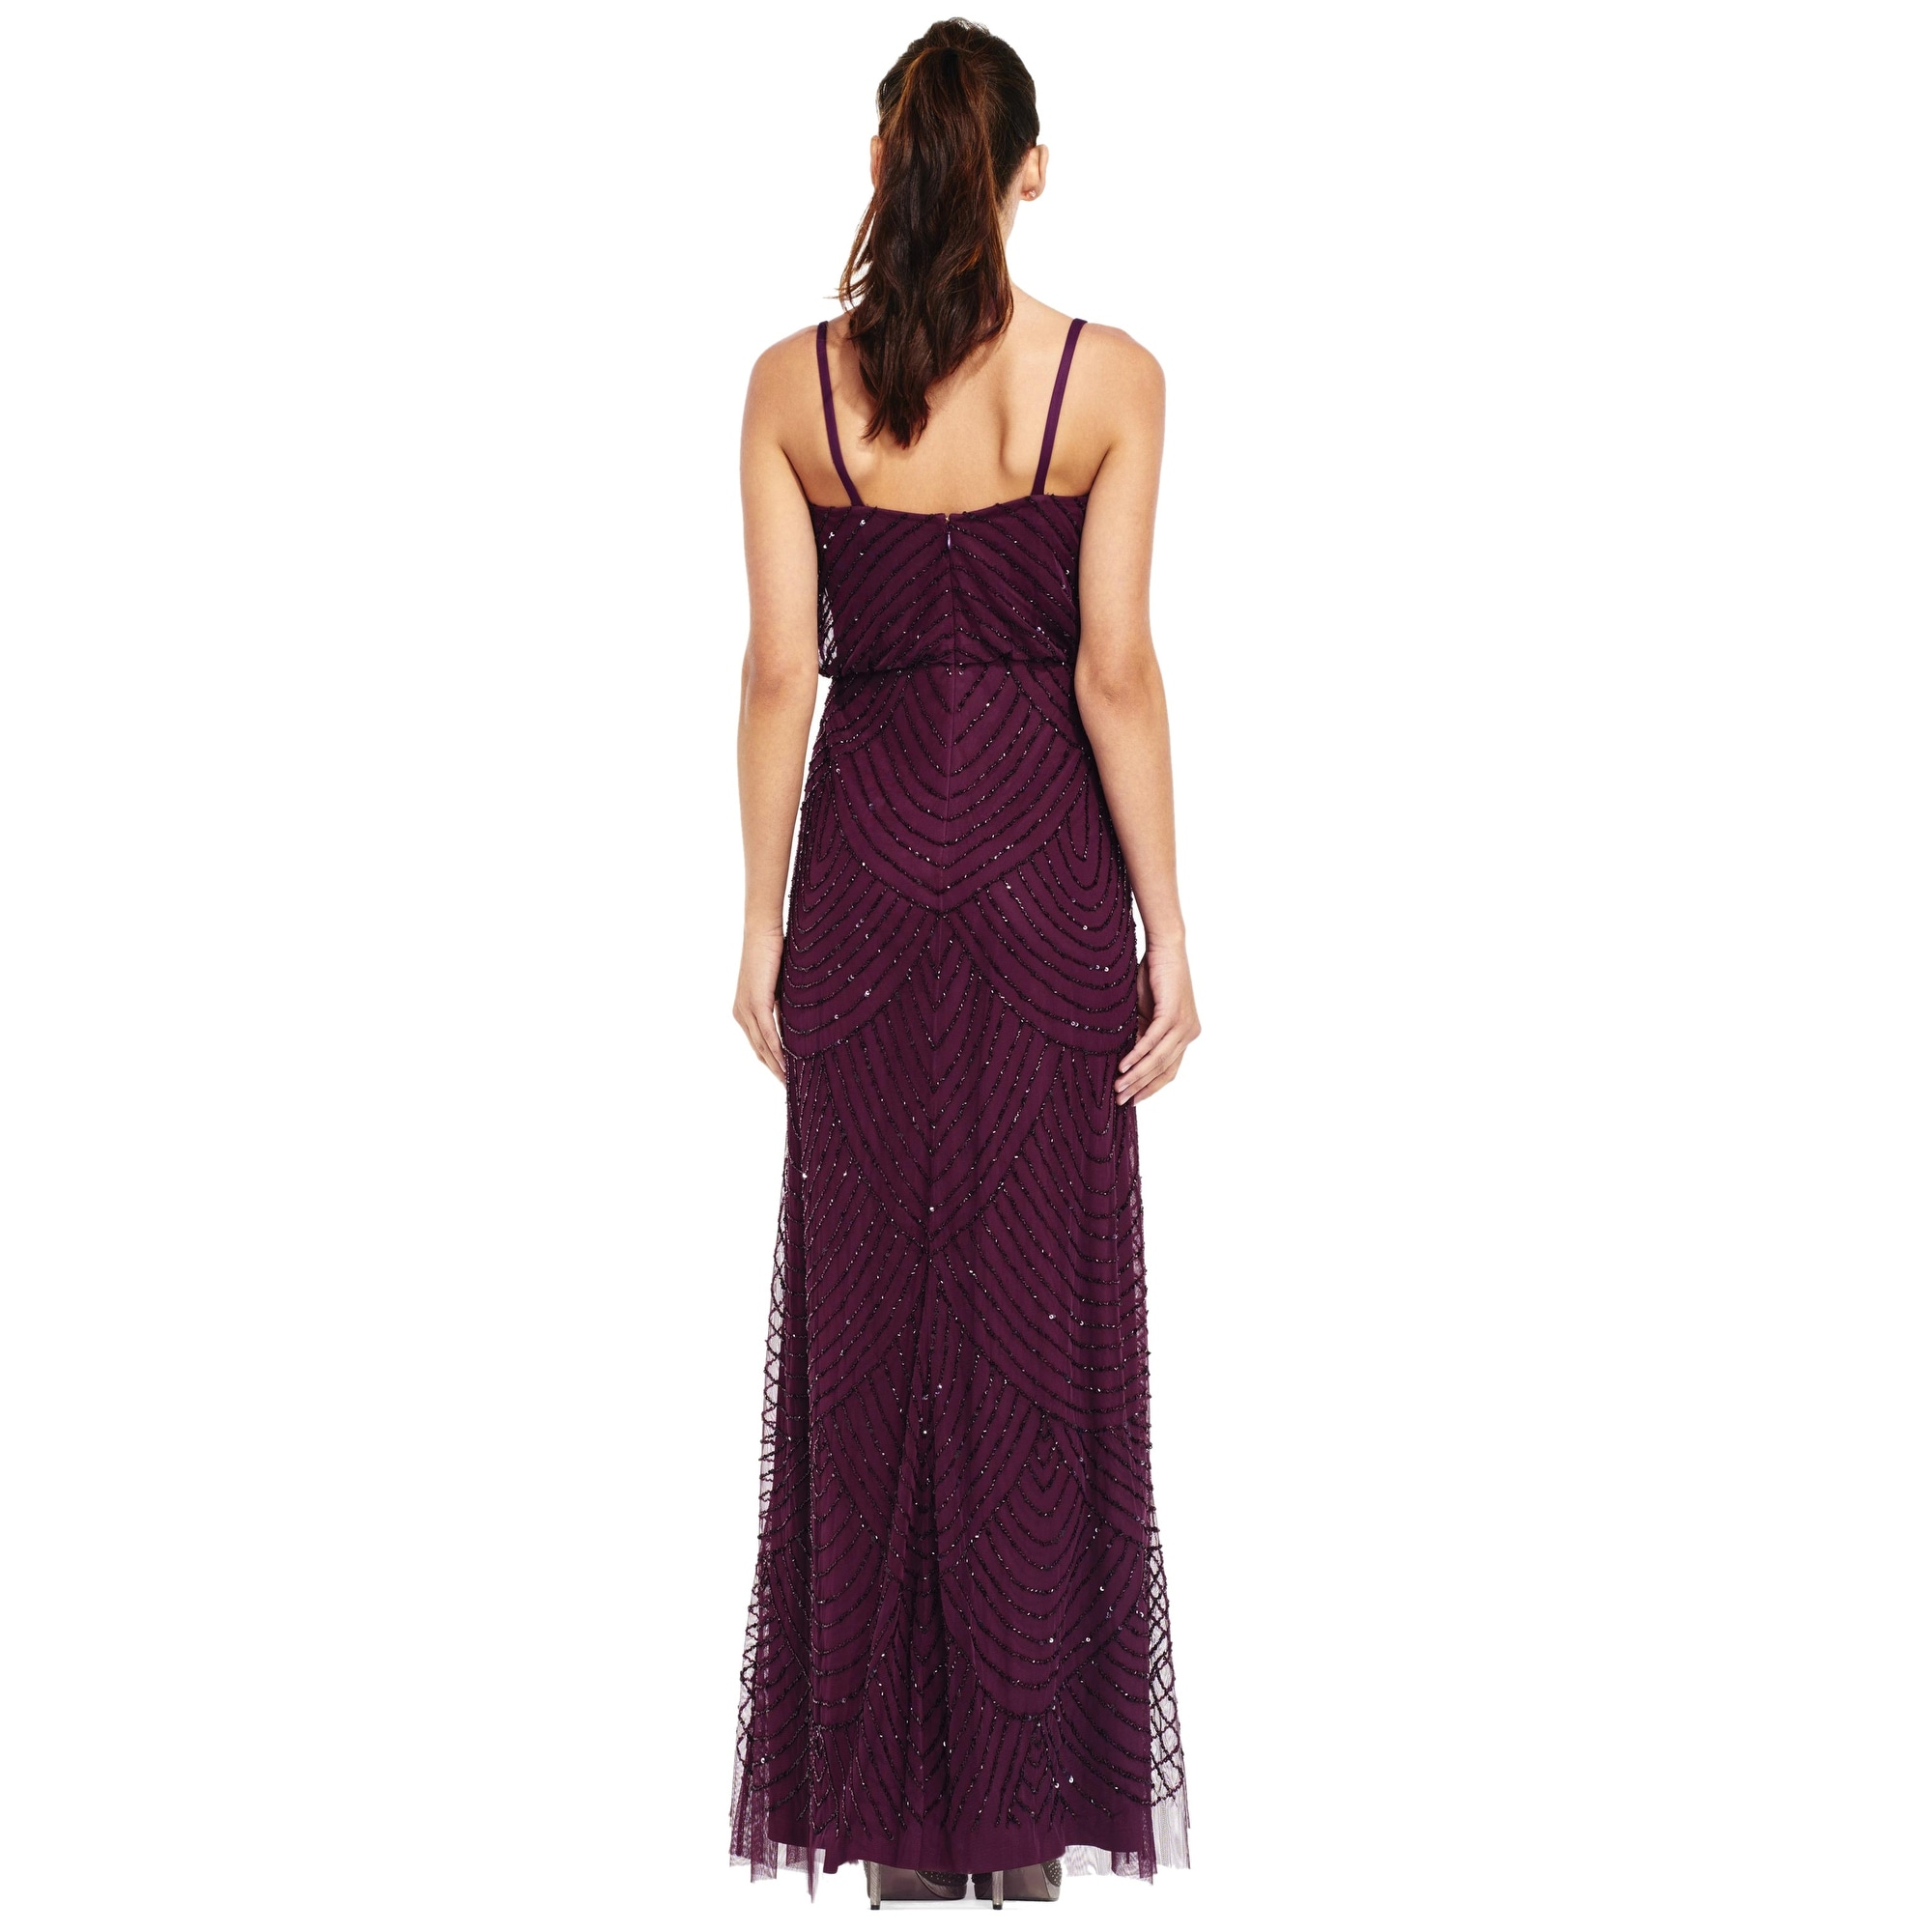 Adrianna Papell Art Deco Beaded Blouson Evening Gown Dress - 6 ...